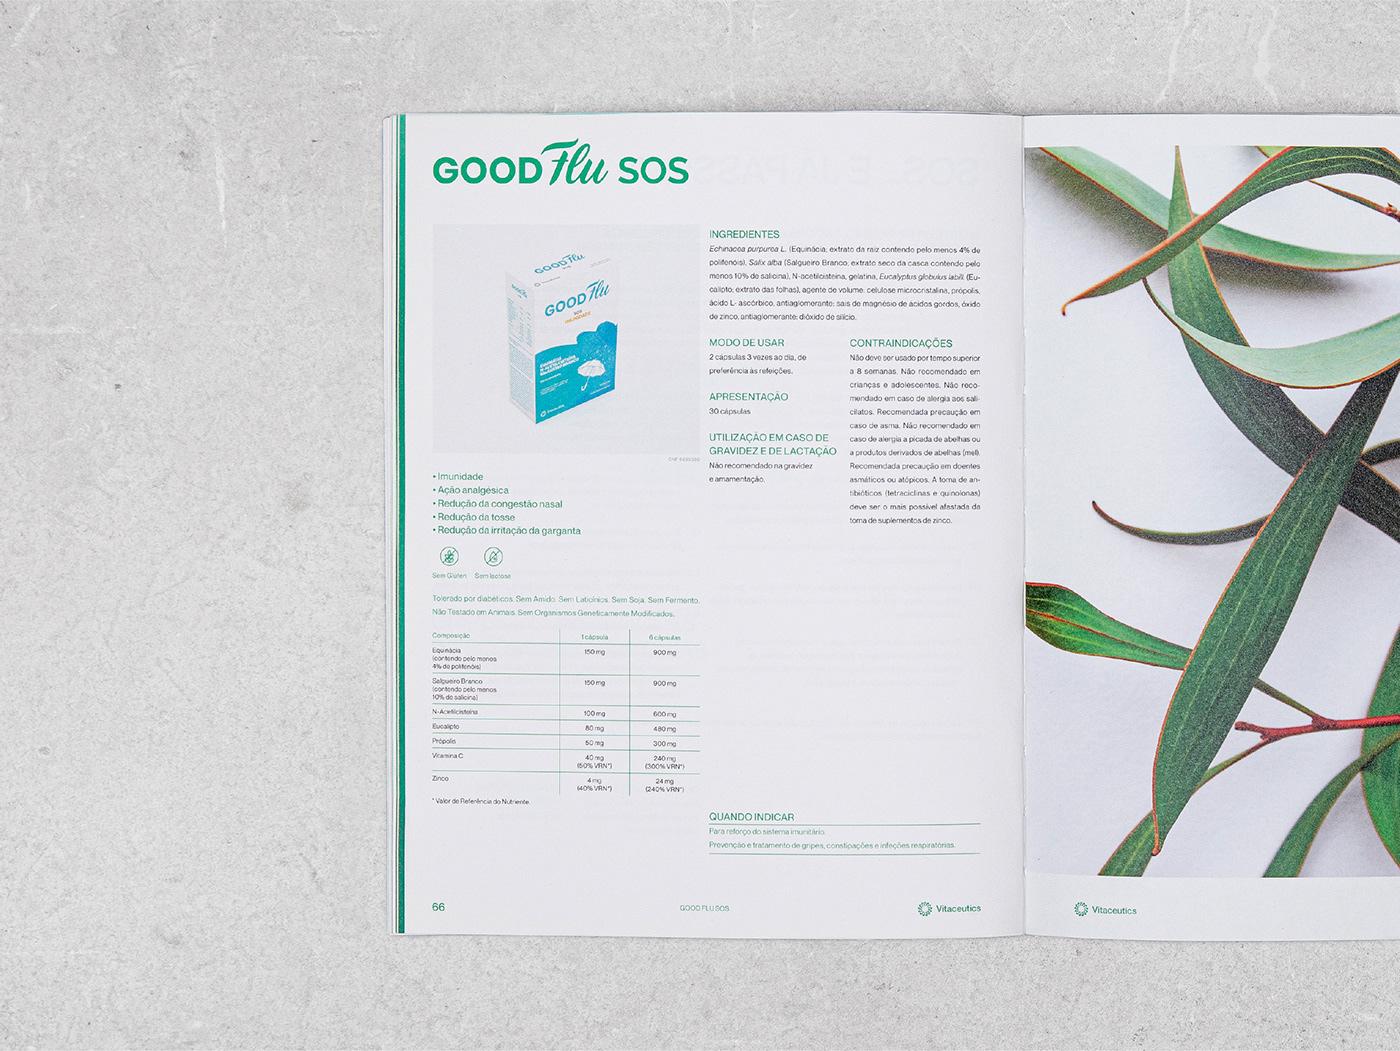 brand diet editorial Health Packaging Pharma probiotics supplements vitamins